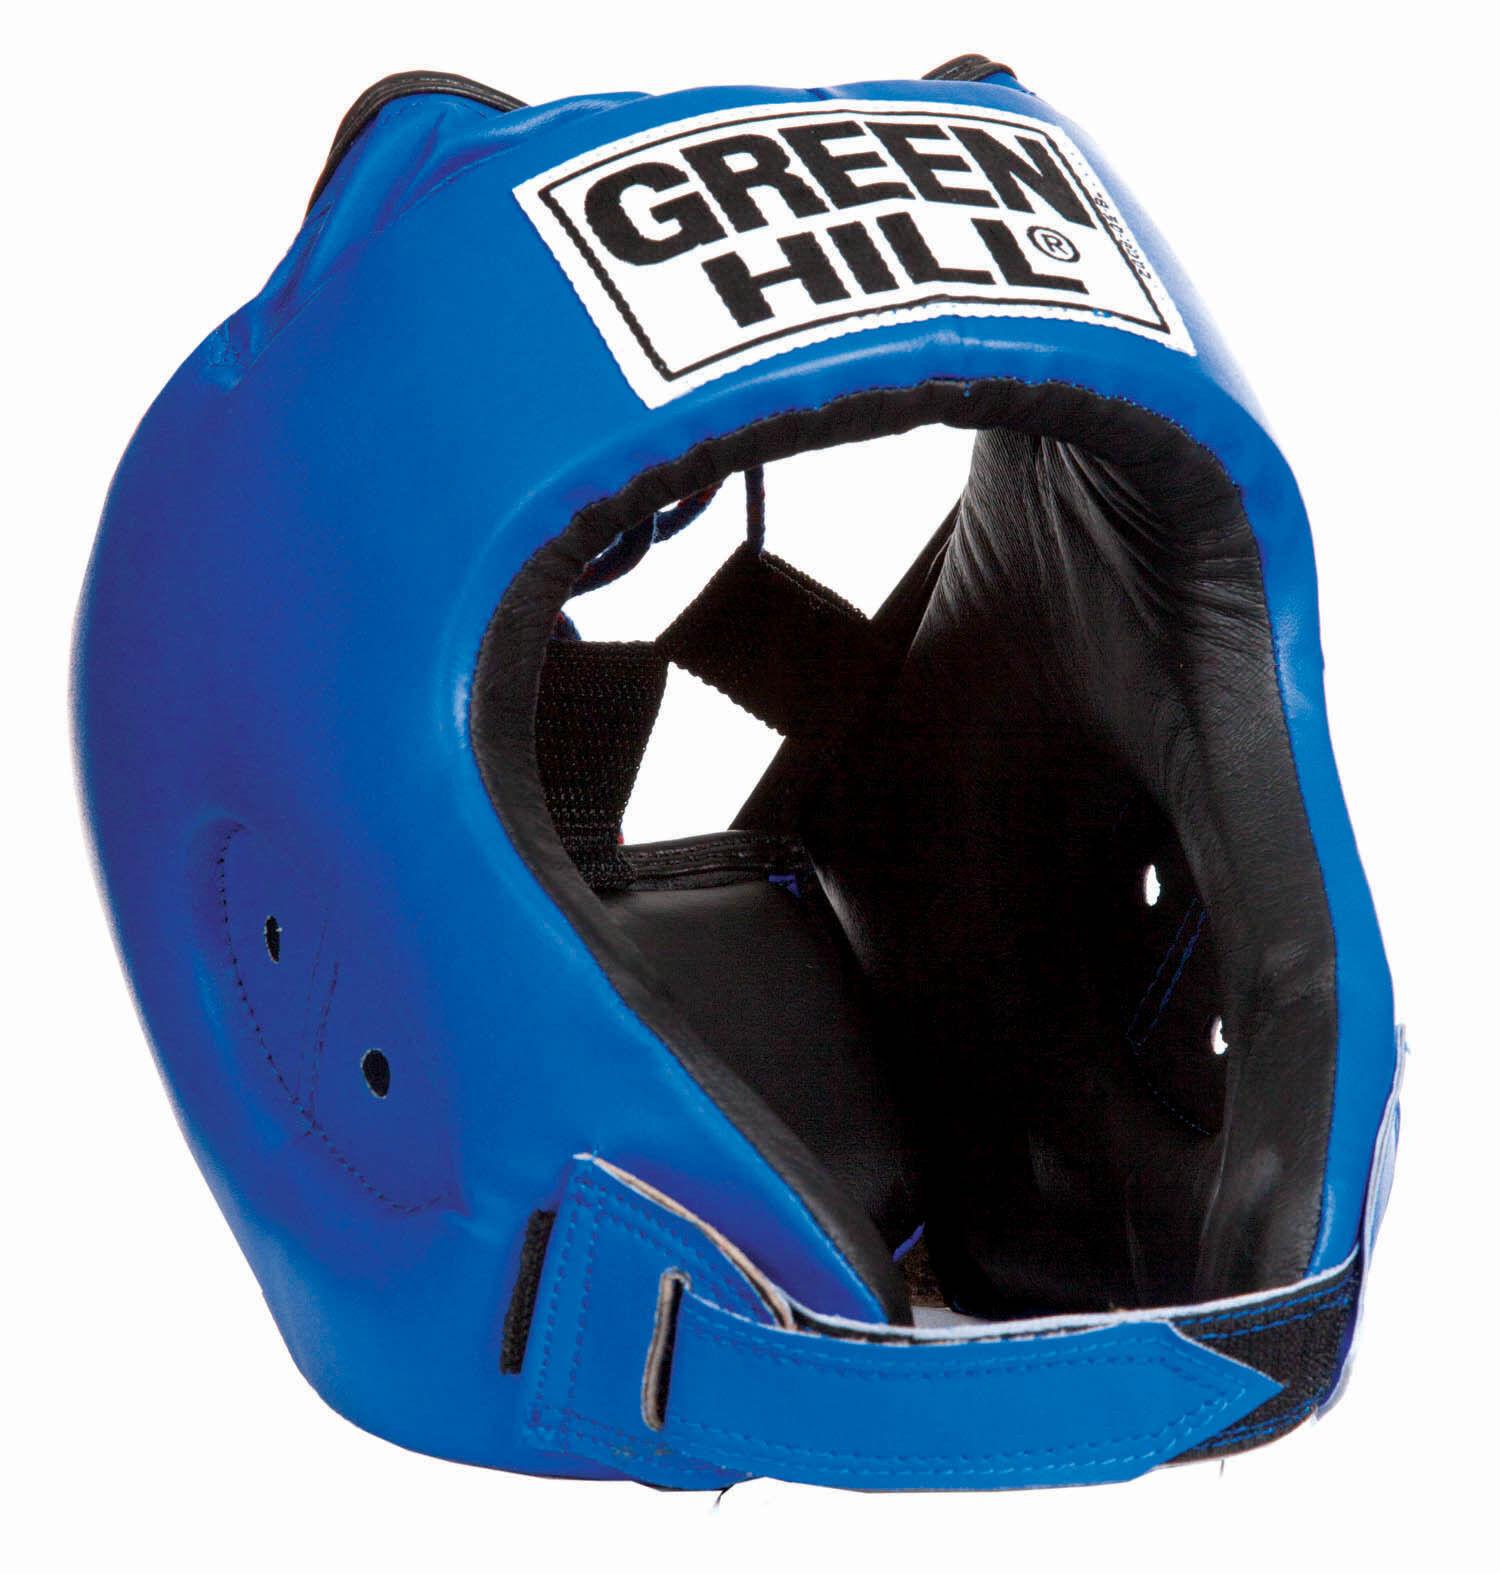 Greenhill boxe casque de protection/ protection/ protection/ rouage alfa training adulte & jeunes 5b1690